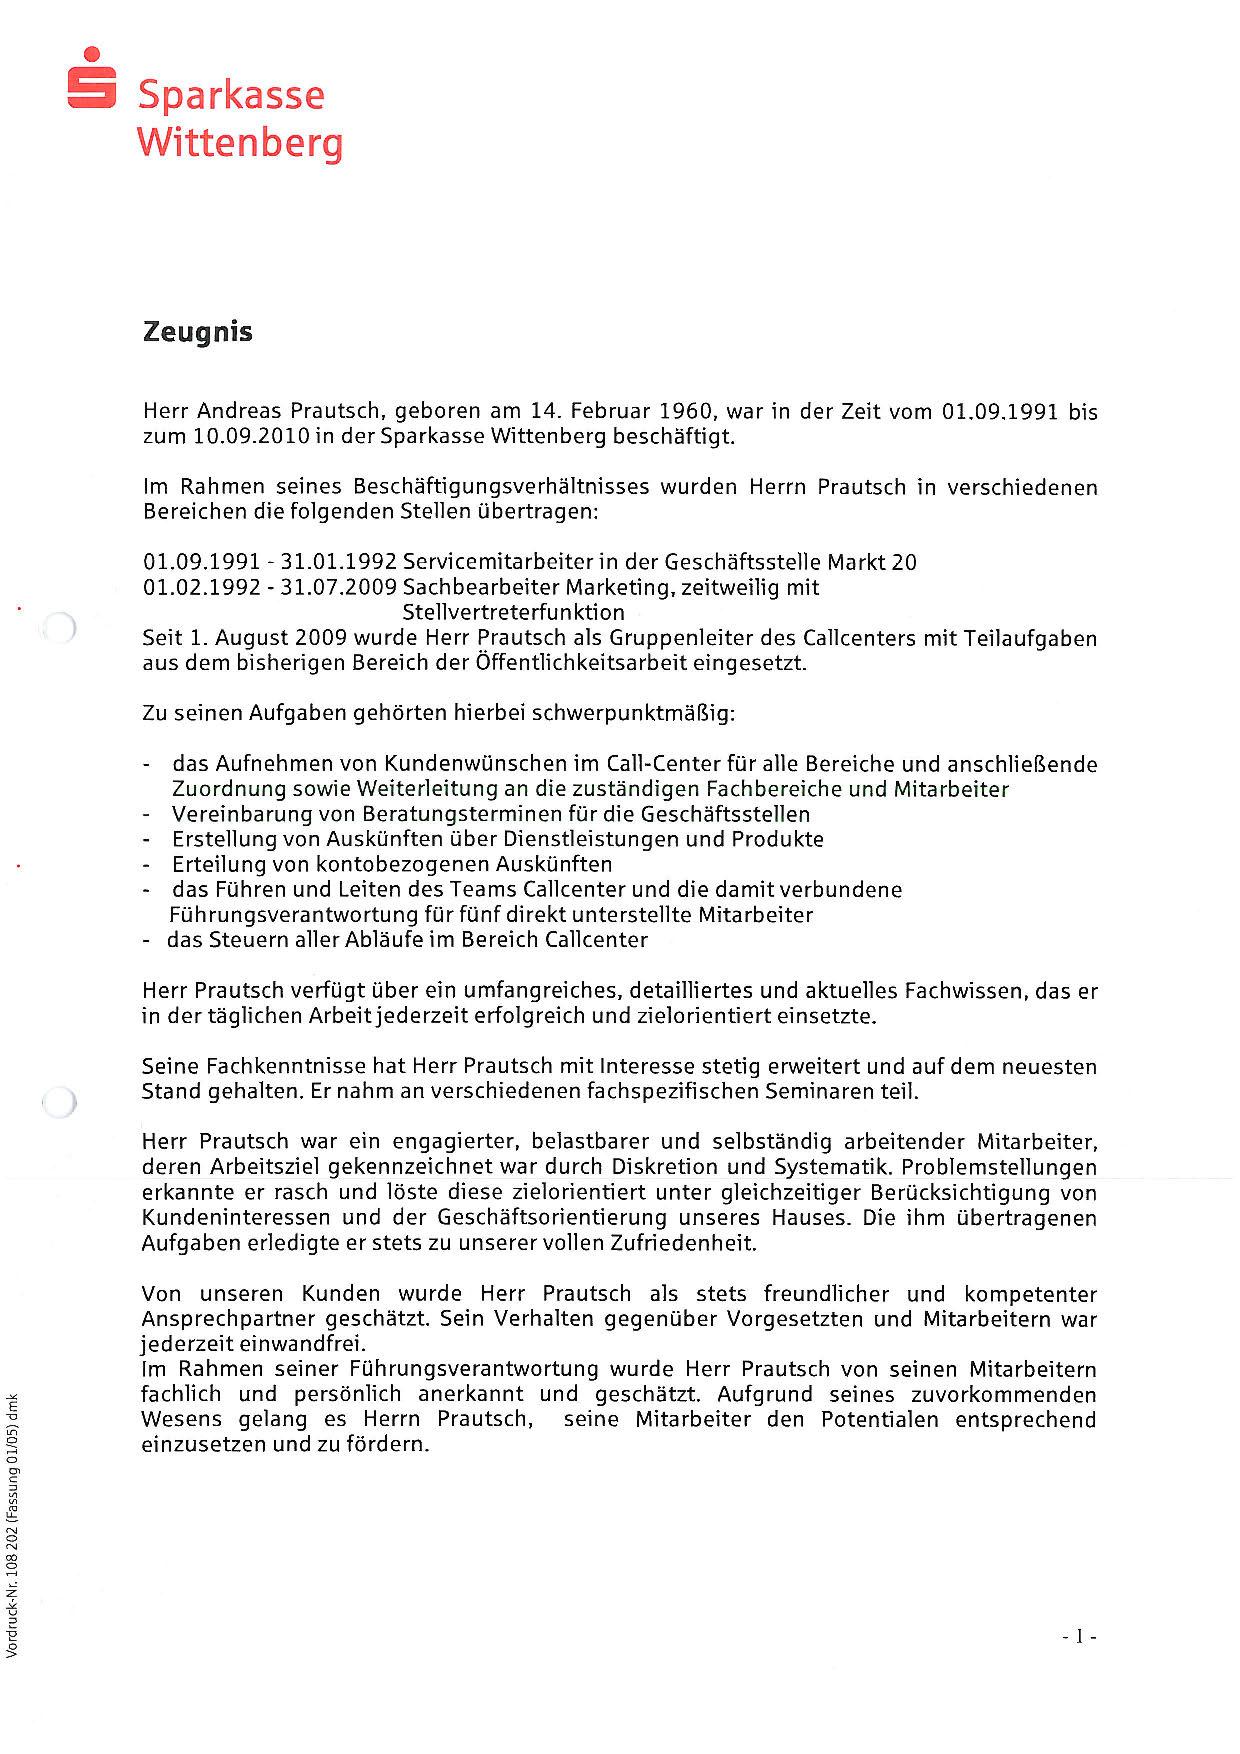 Sparkasse Zeugnis Teil 1 - 2010